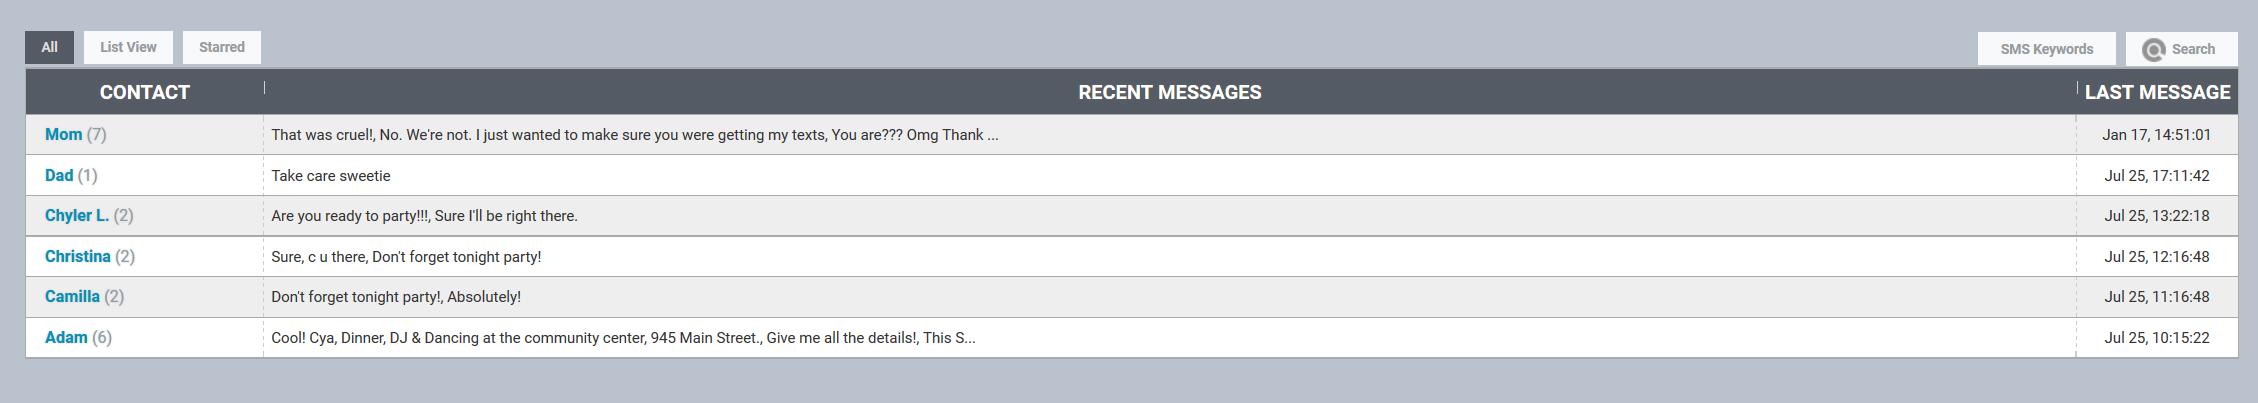 SMS Überwachung